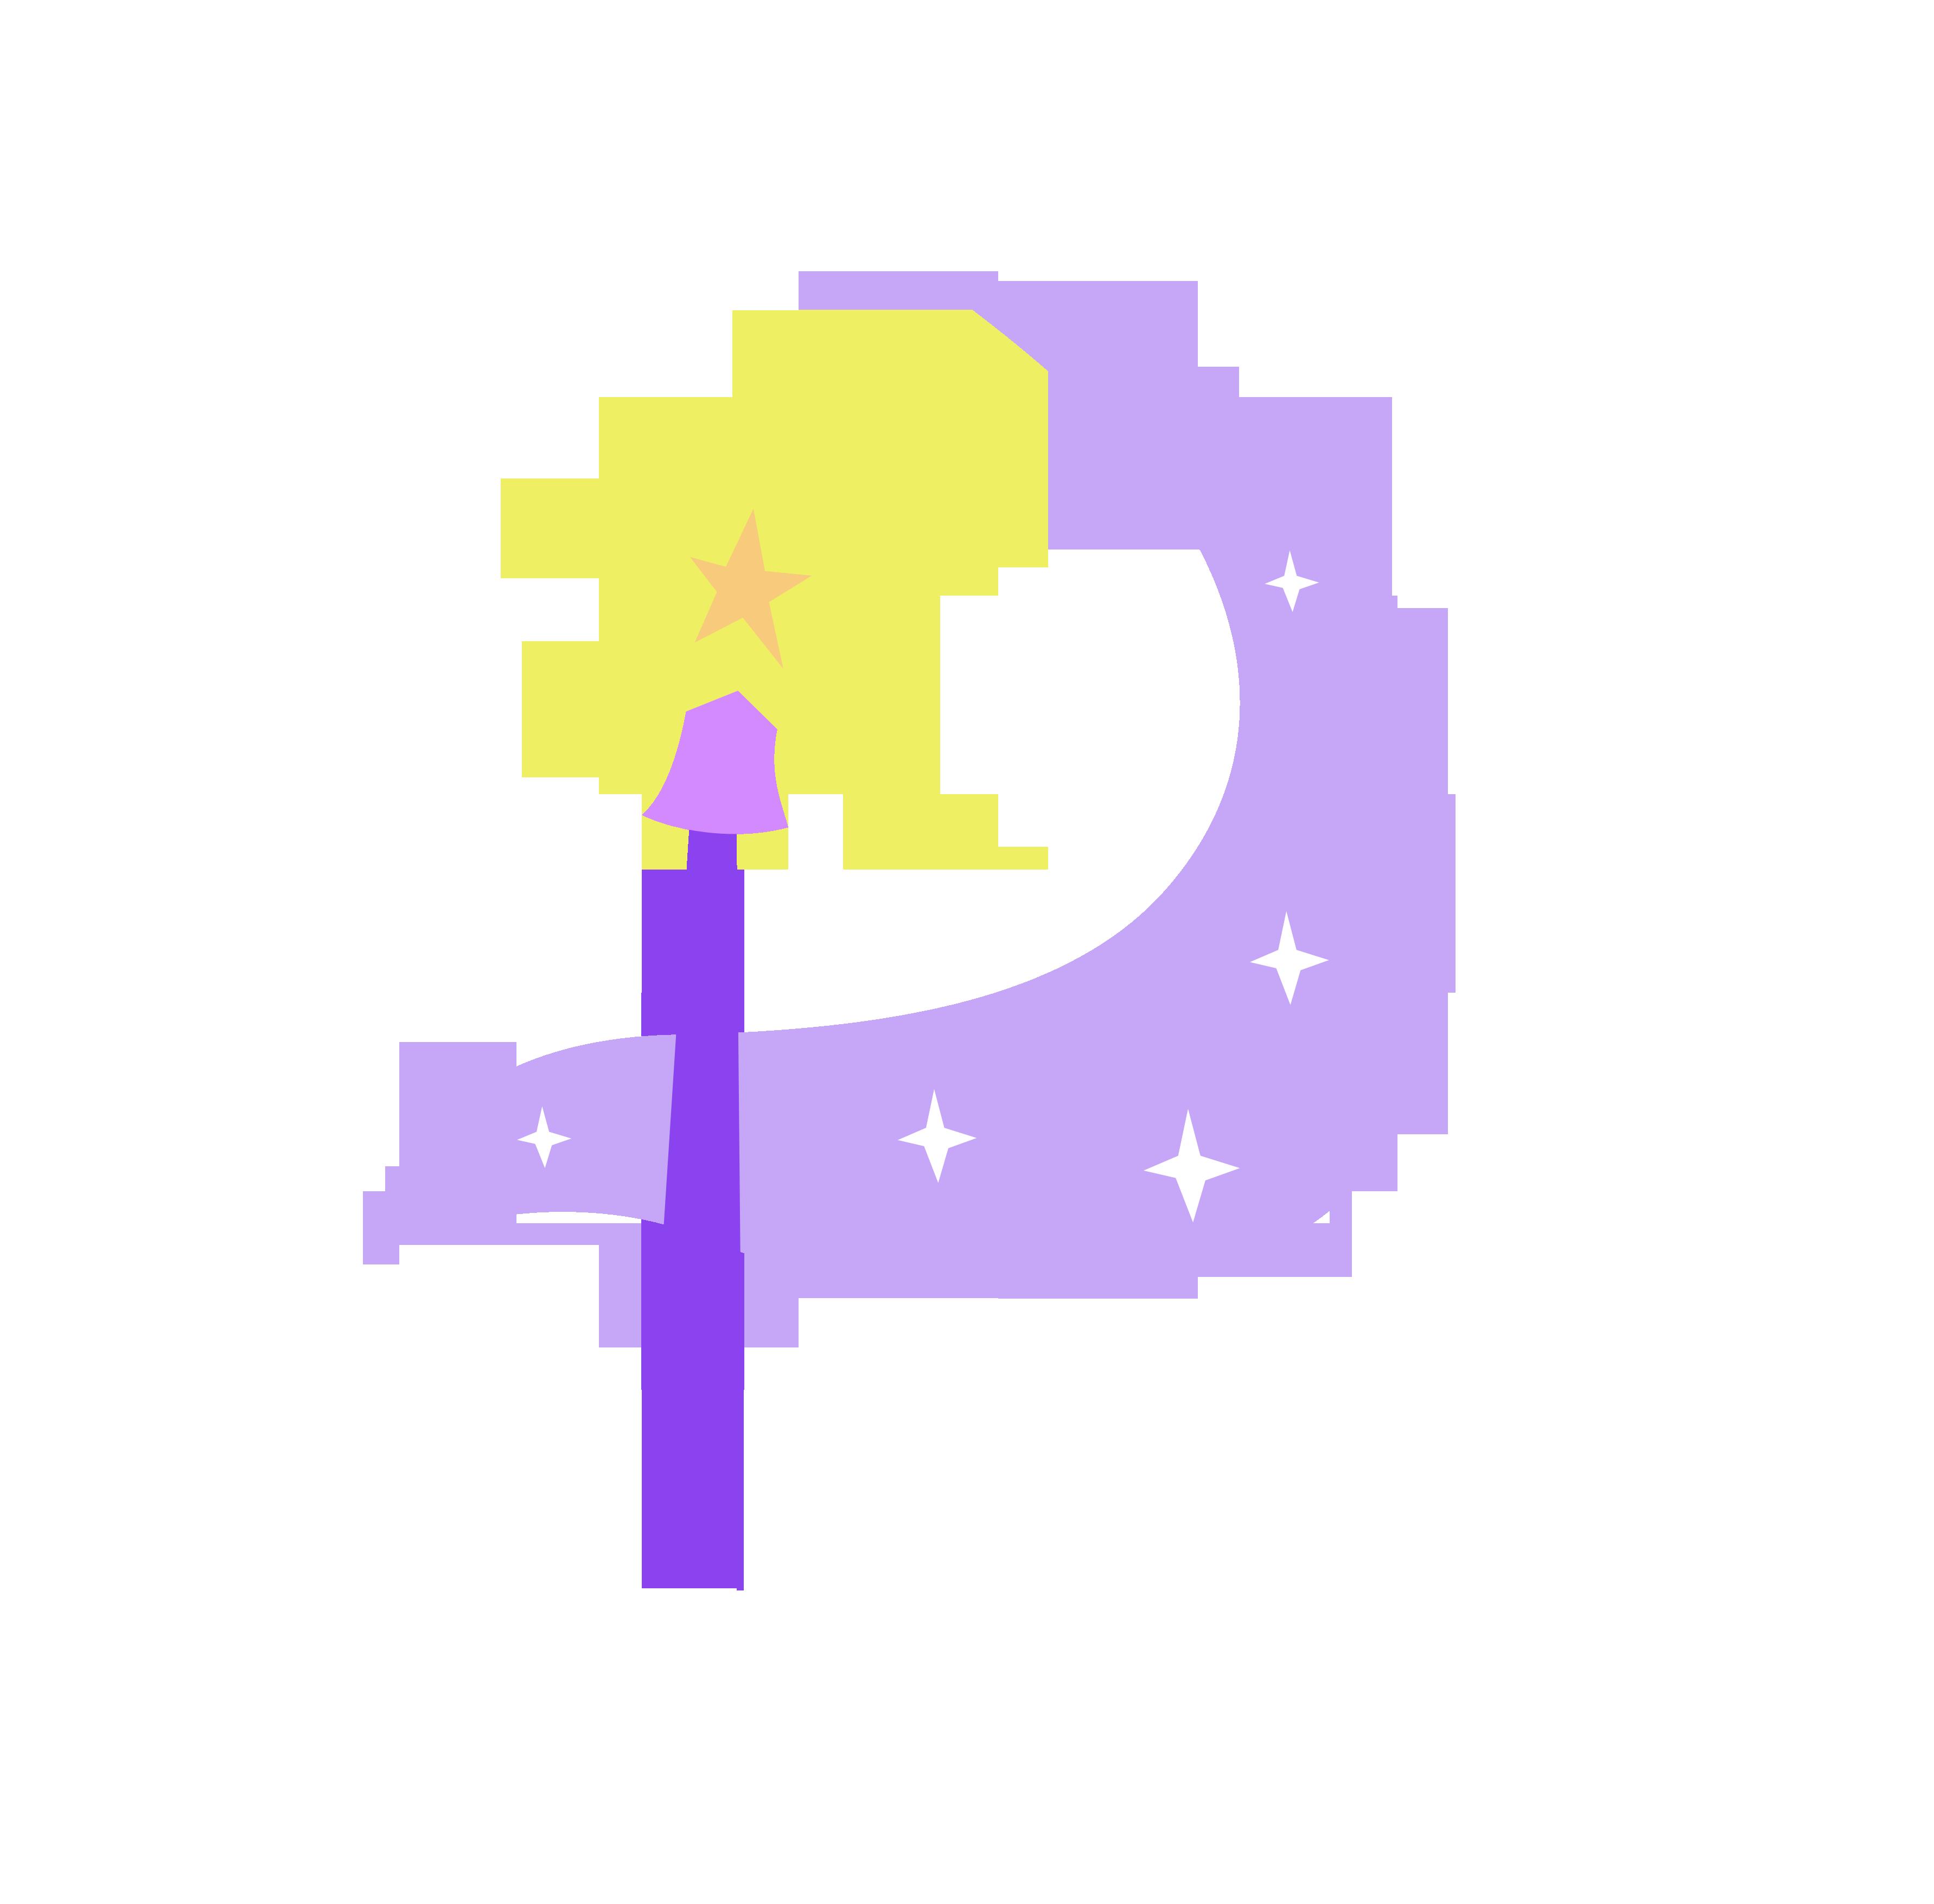 Cutie Mark - Magic Moon (Adventures in Ponyville) by Durpy